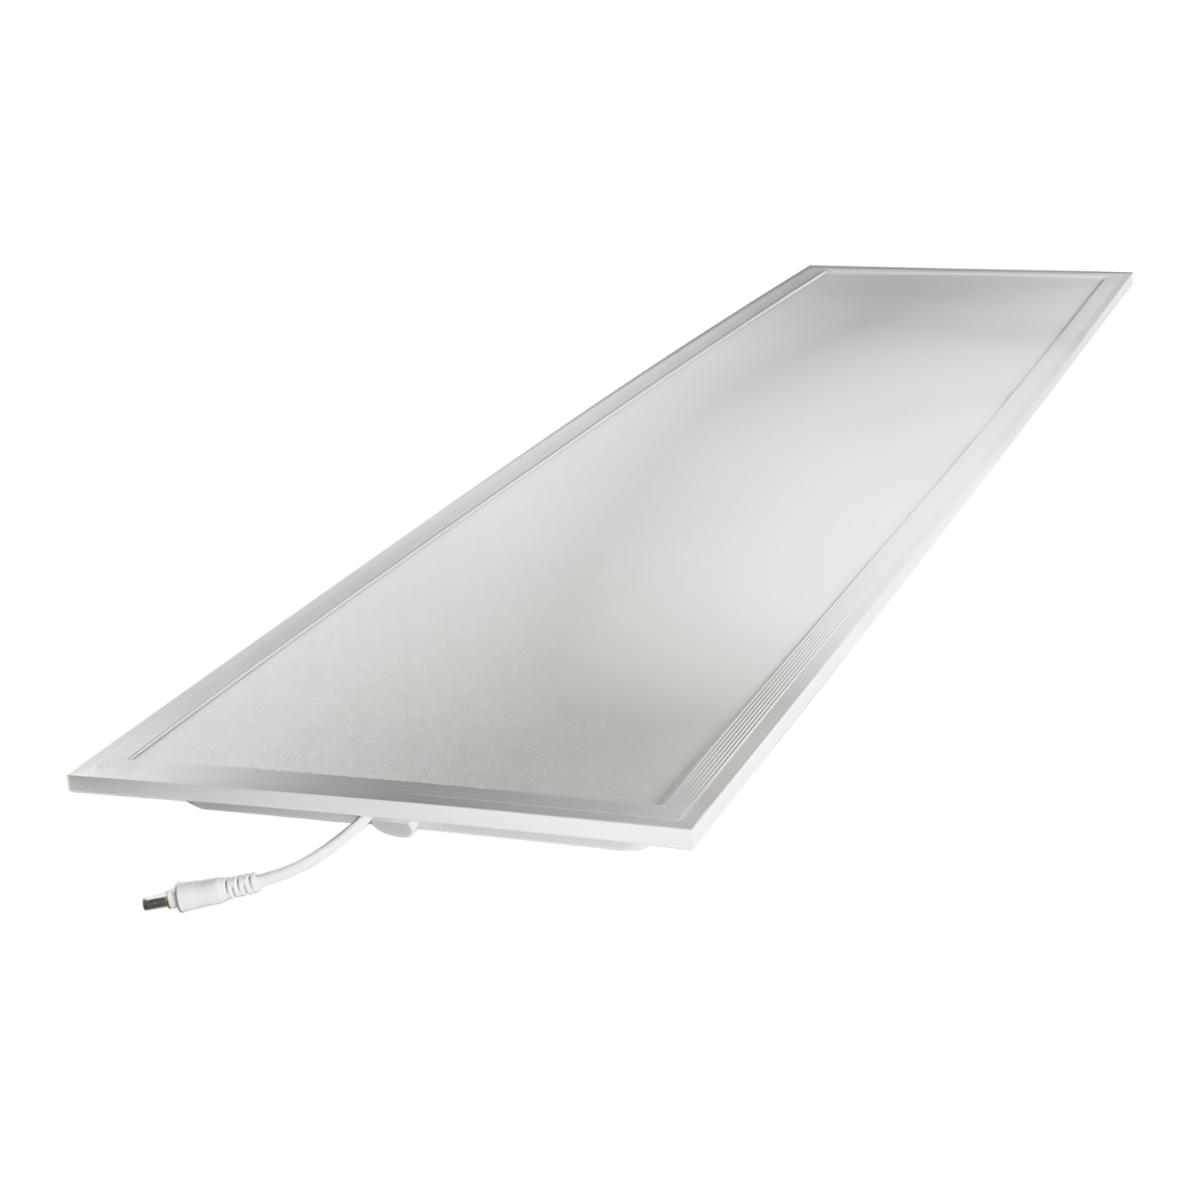 Noxion Panel LED Econox 32W Xitanium DALI 30x120cm 3000K 3900lm UGR <22 | Dali Regulable - Luz Cálida - Reemplazo 2x36W